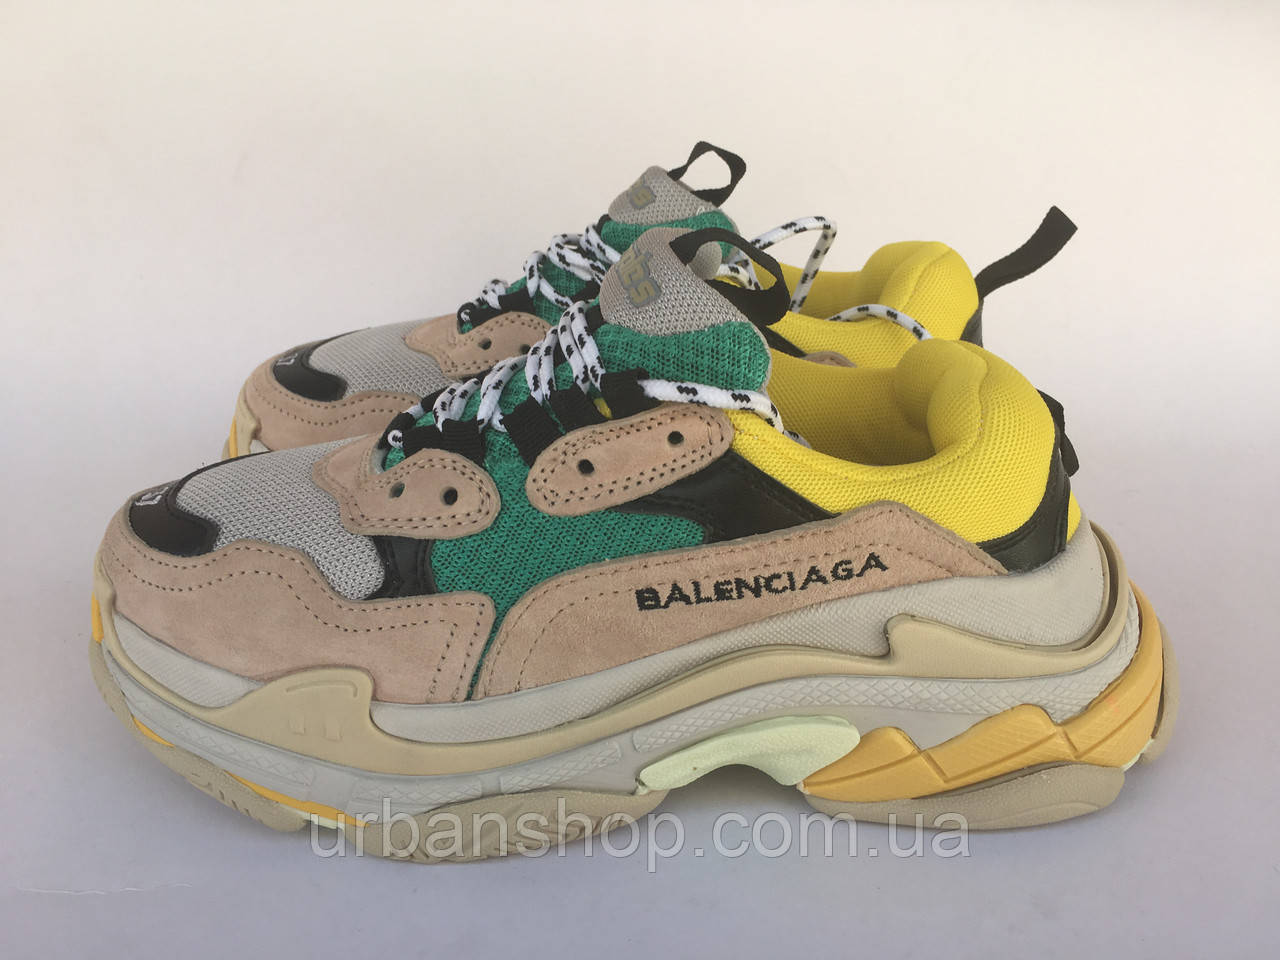 cool How to wear Balenciaga triple S Pinterest